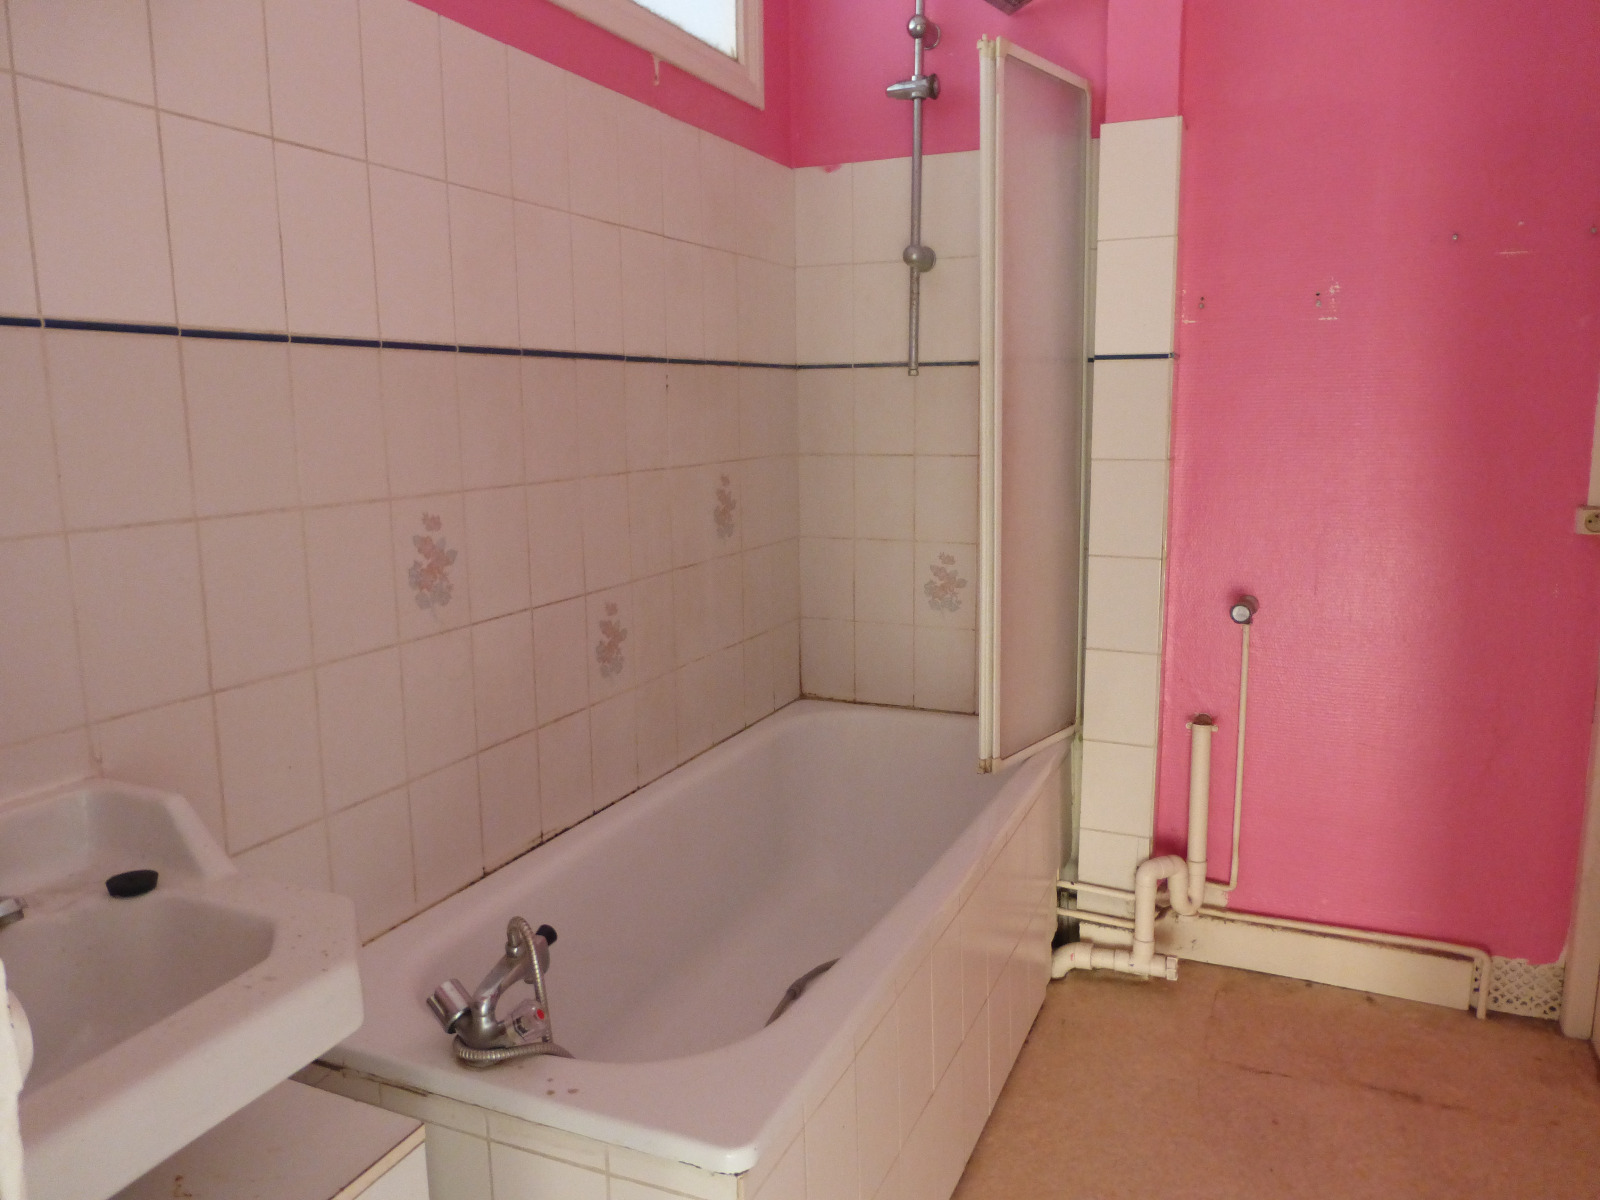 maison de type bel tage avec garage h nin beaumont accedimmo agence h nin beaumont. Black Bedroom Furniture Sets. Home Design Ideas